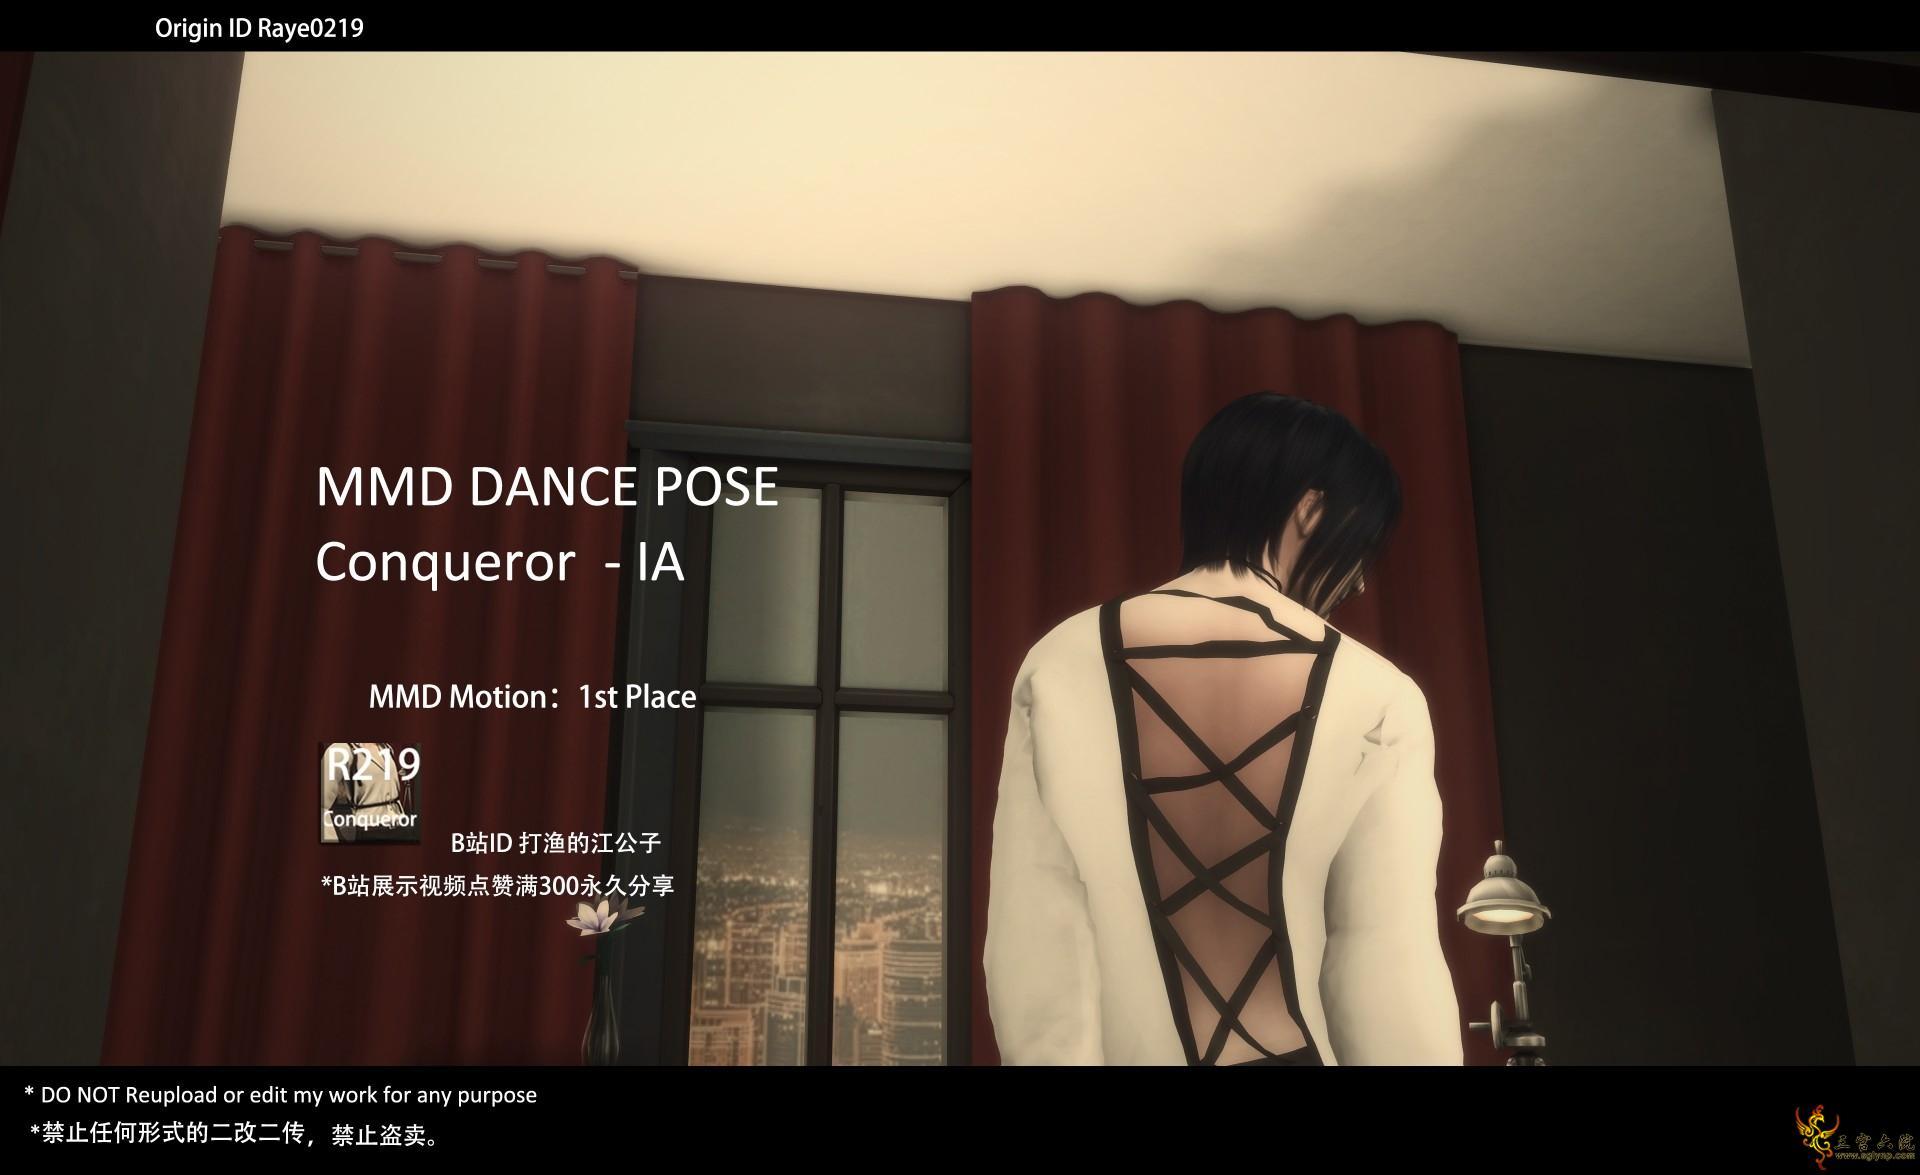 【R219】MMD Dance Pose Conqueror 02 .jpg